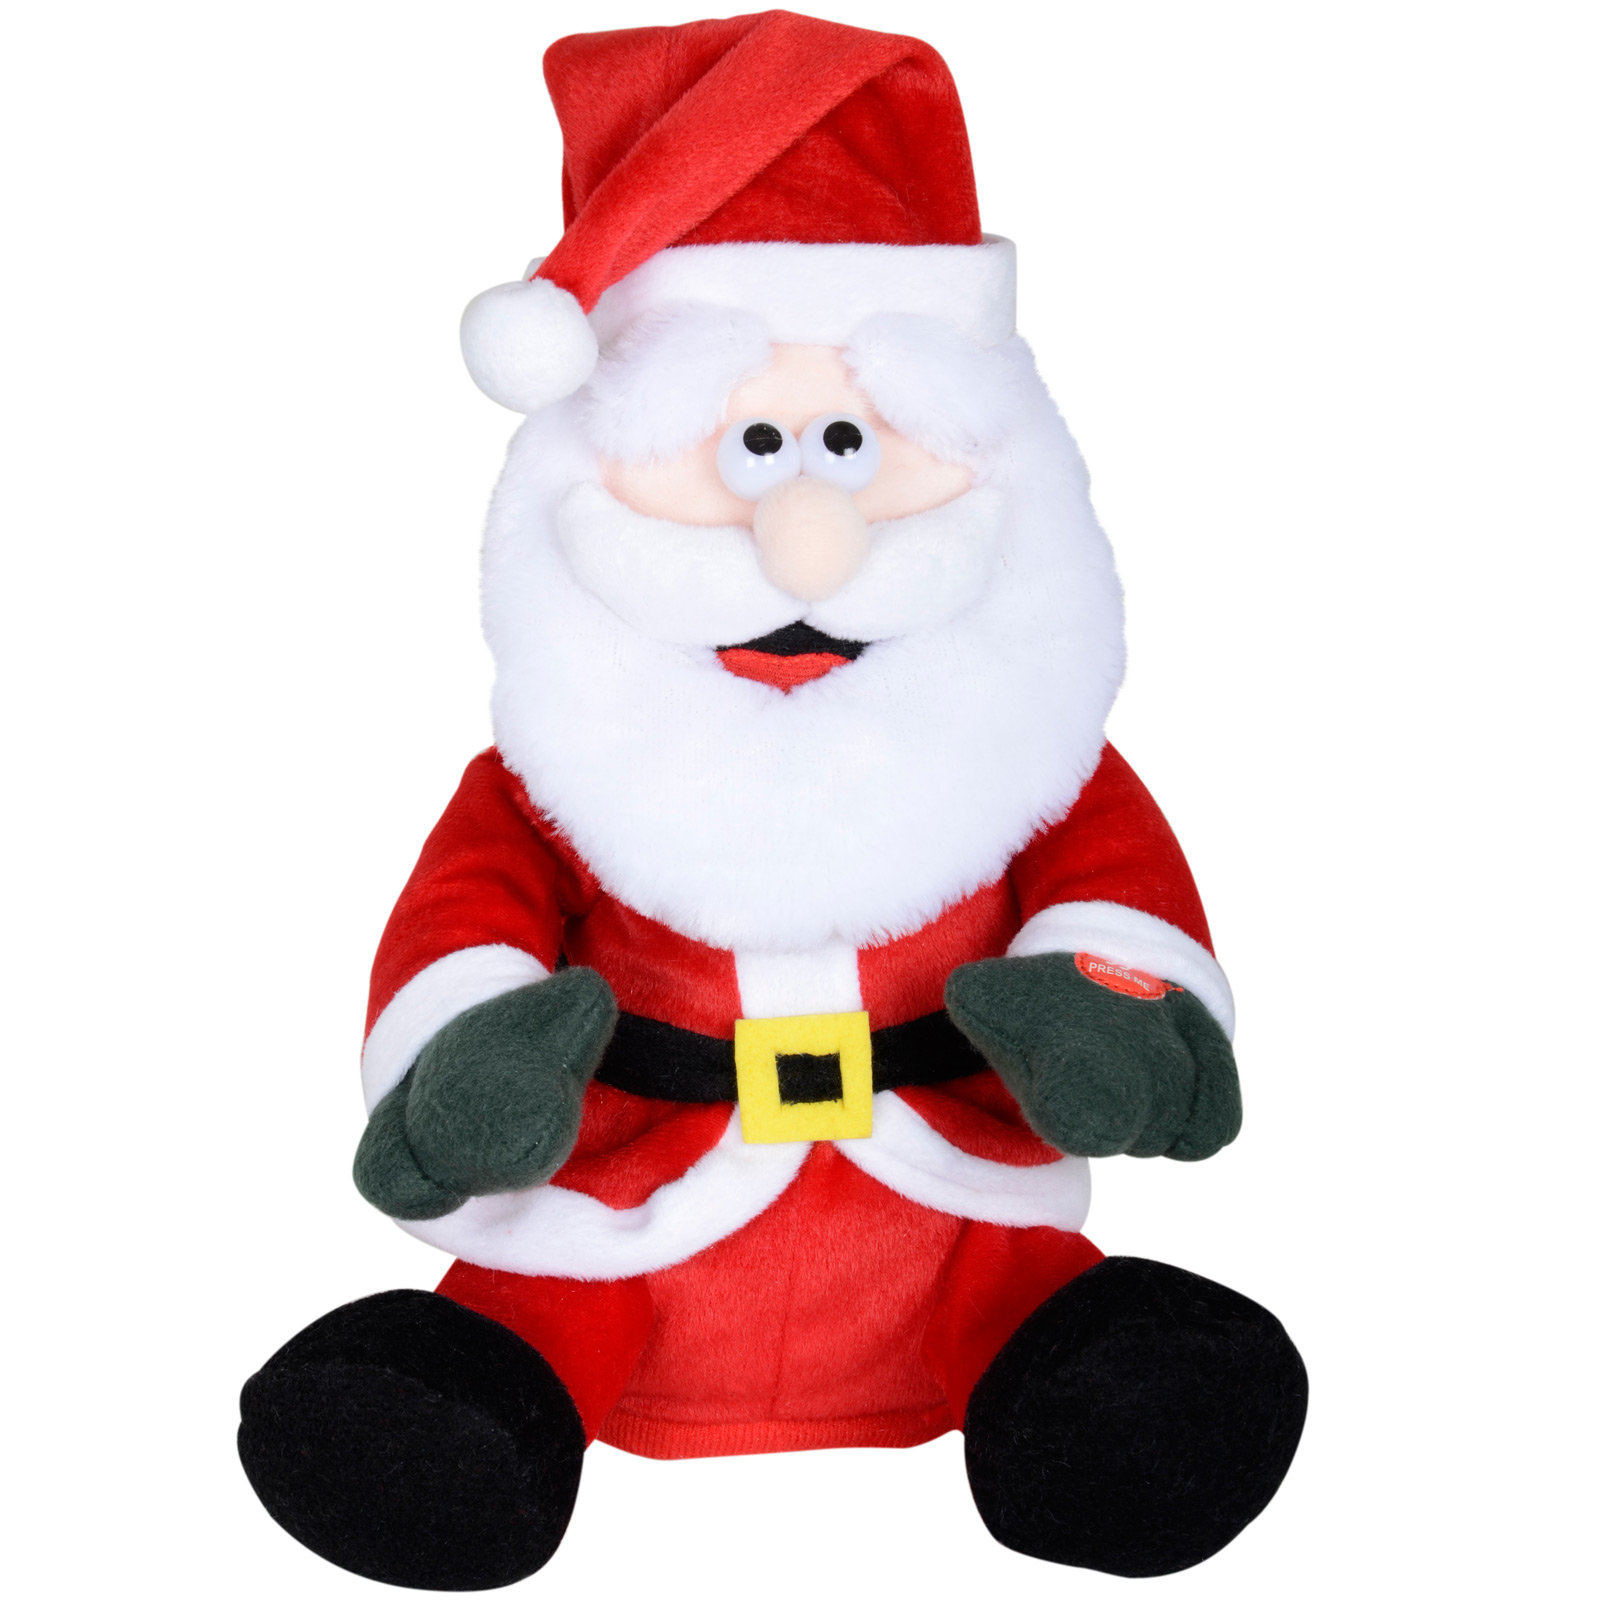 Musical christmas ornaments that play music - 31cm Dancing Santa Claus Ornament With Xmas Rap Music